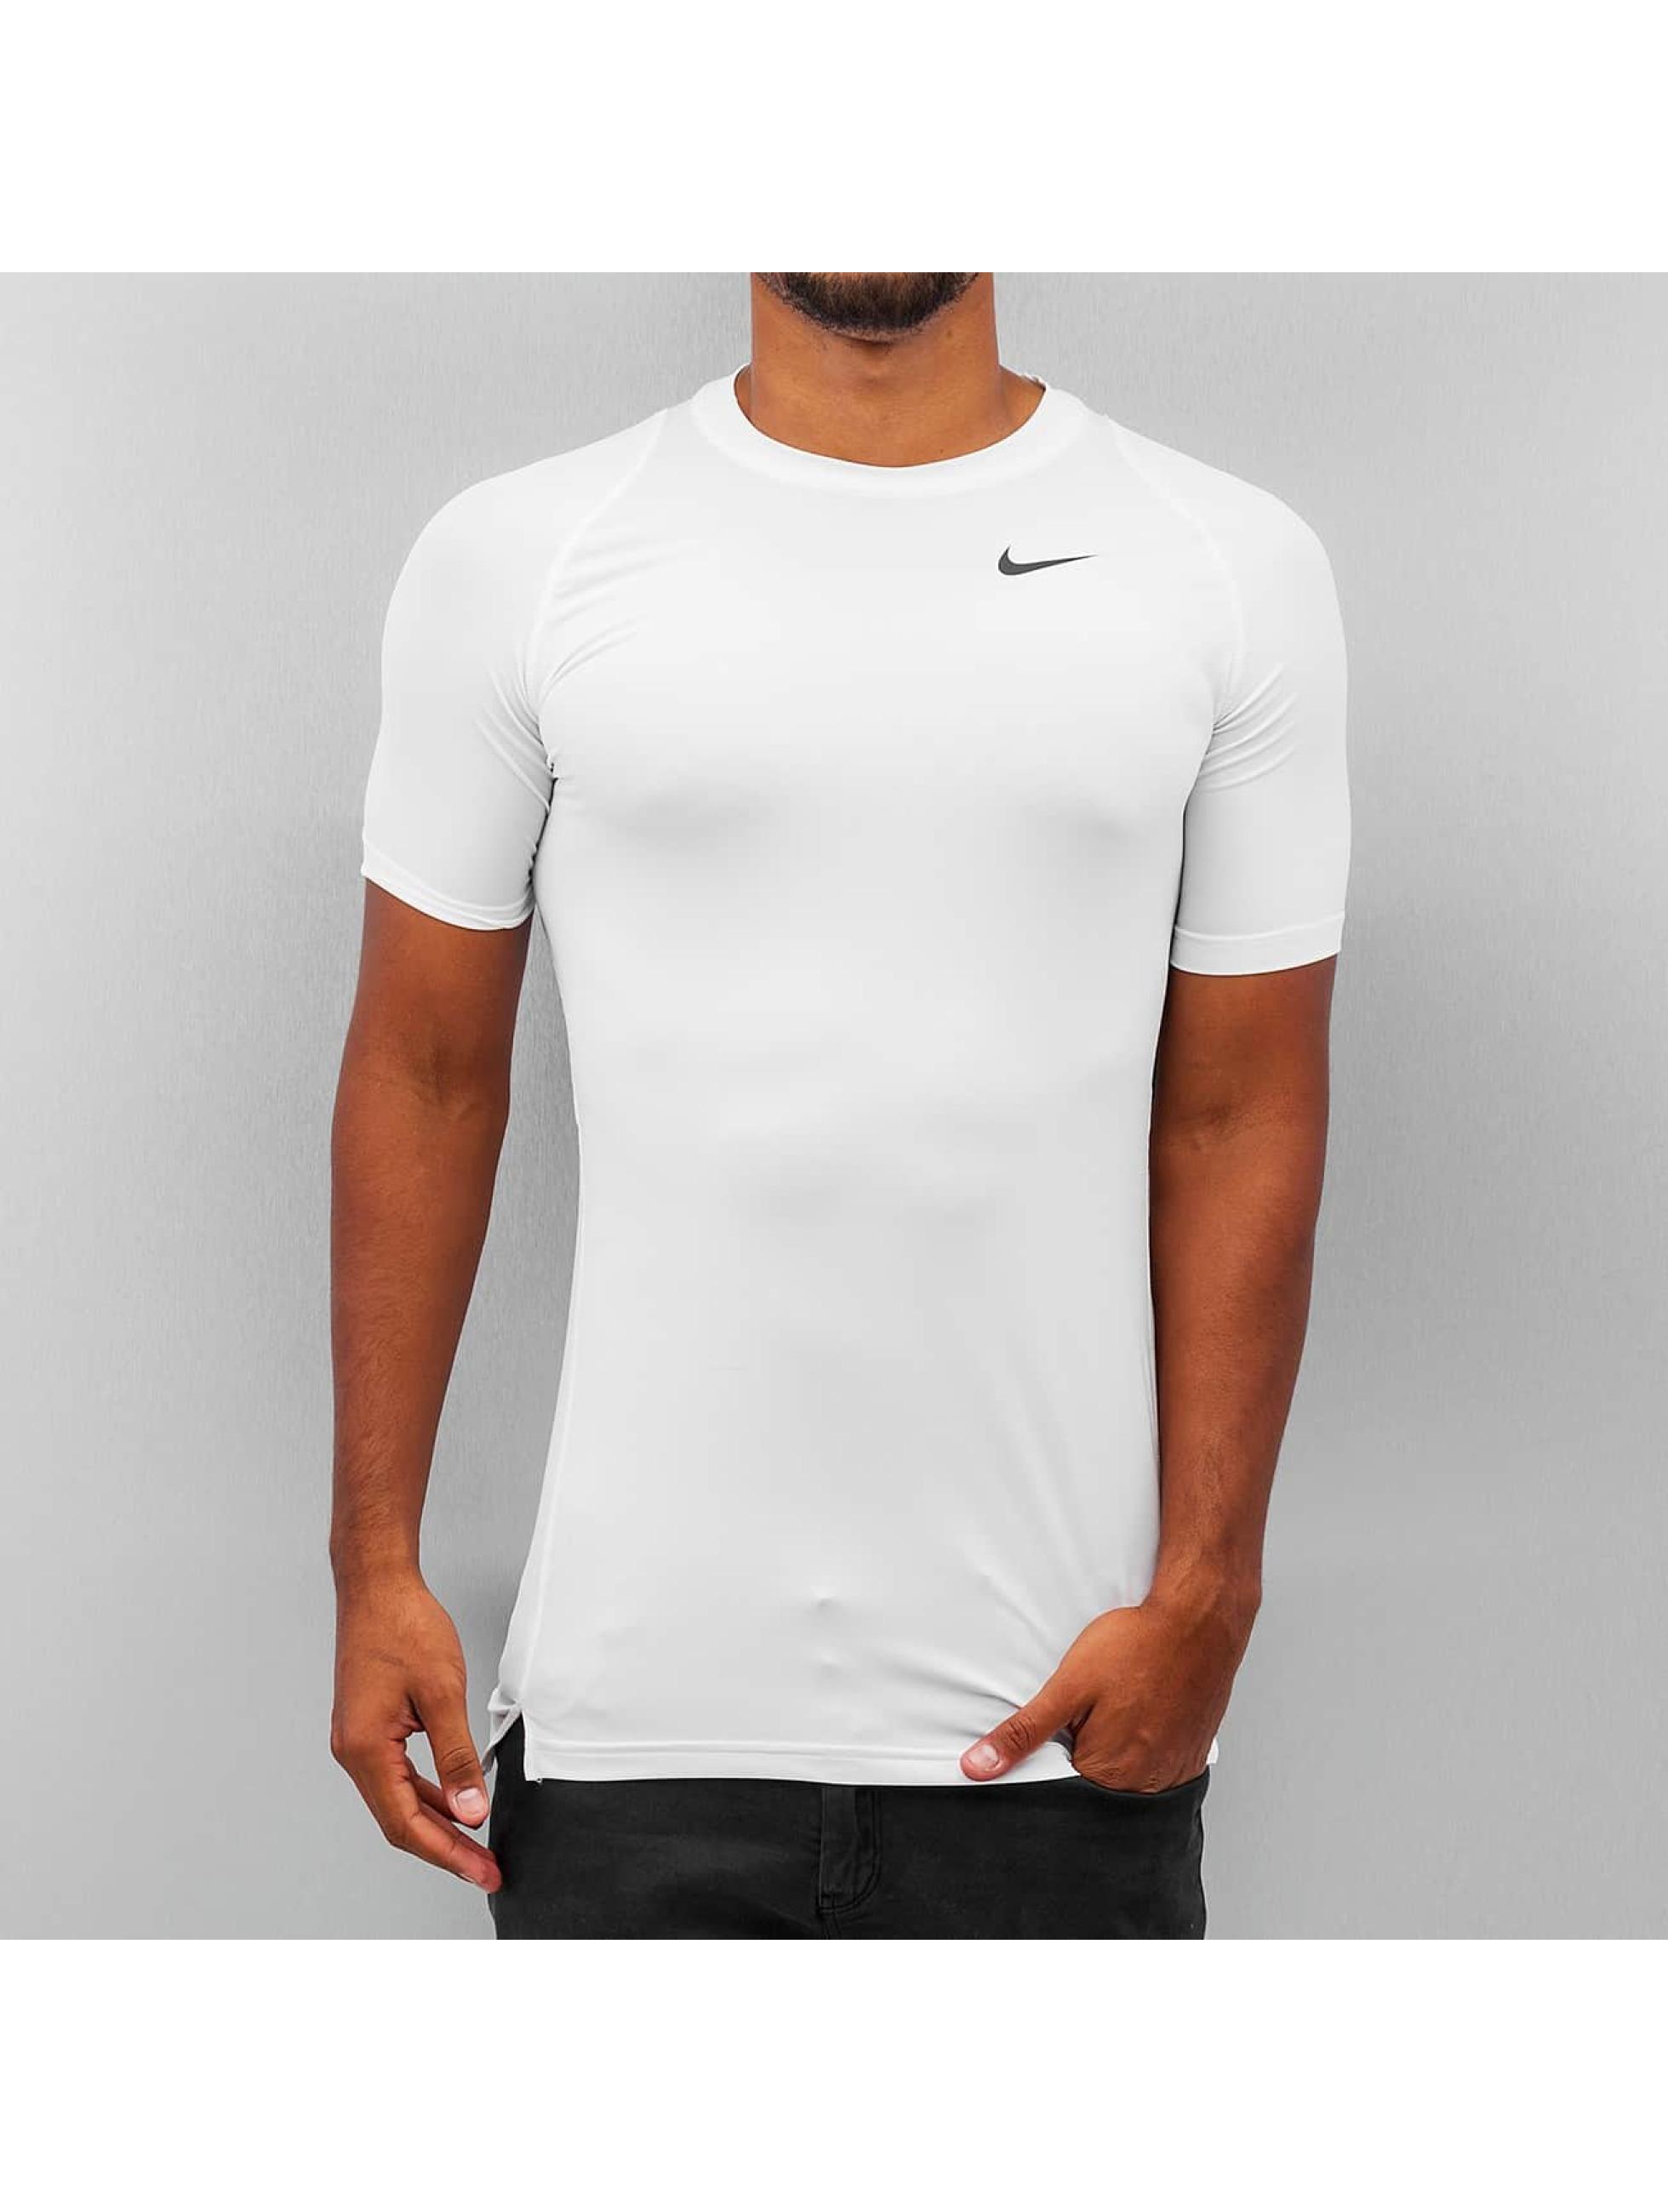 Nike Performance Männer T-Shirt Pro Cool Compression in weiß